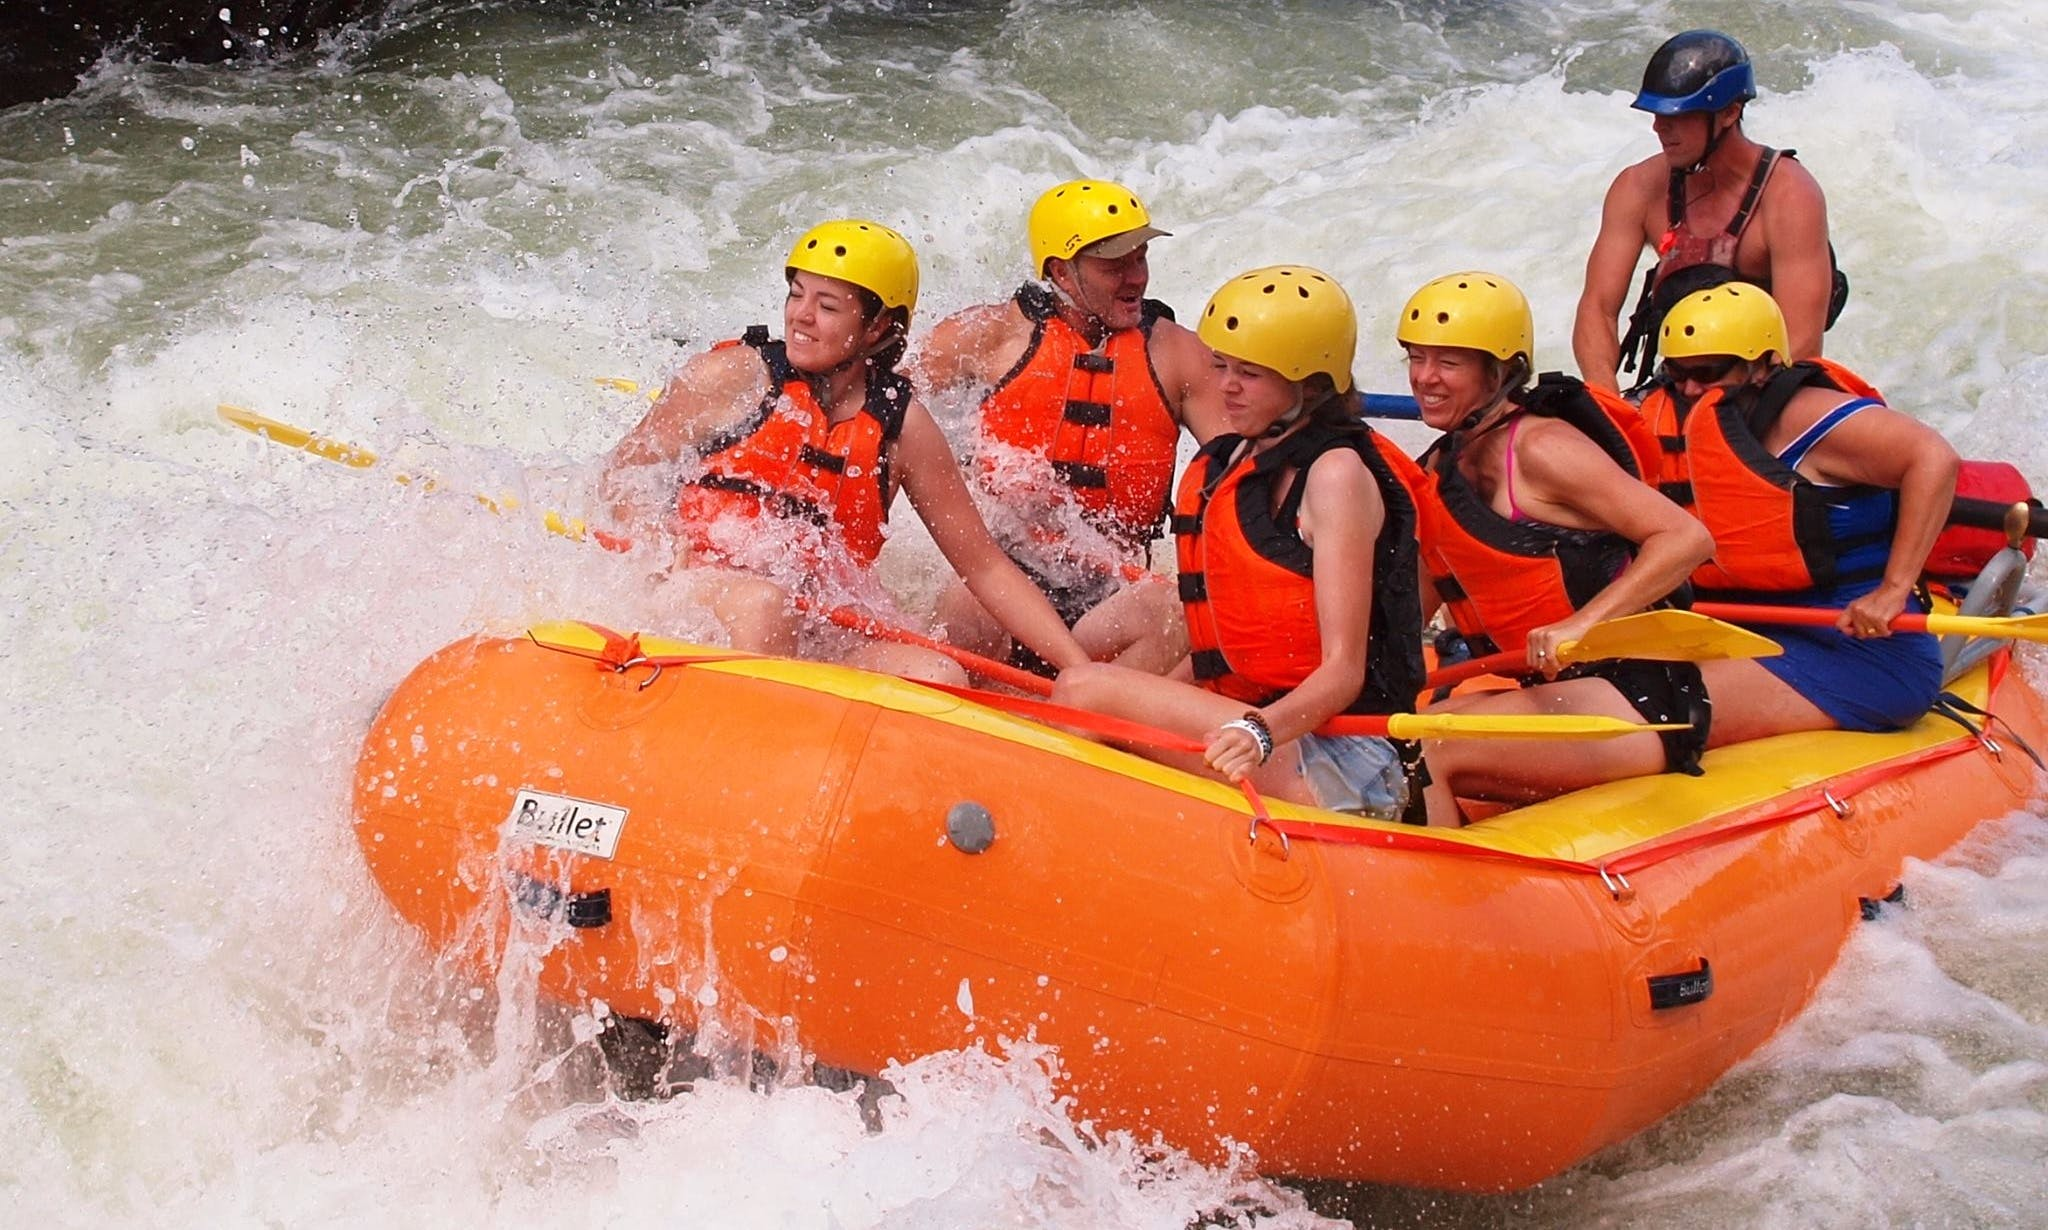 White Water Rafting Trips in Turrialba, Costa Rica